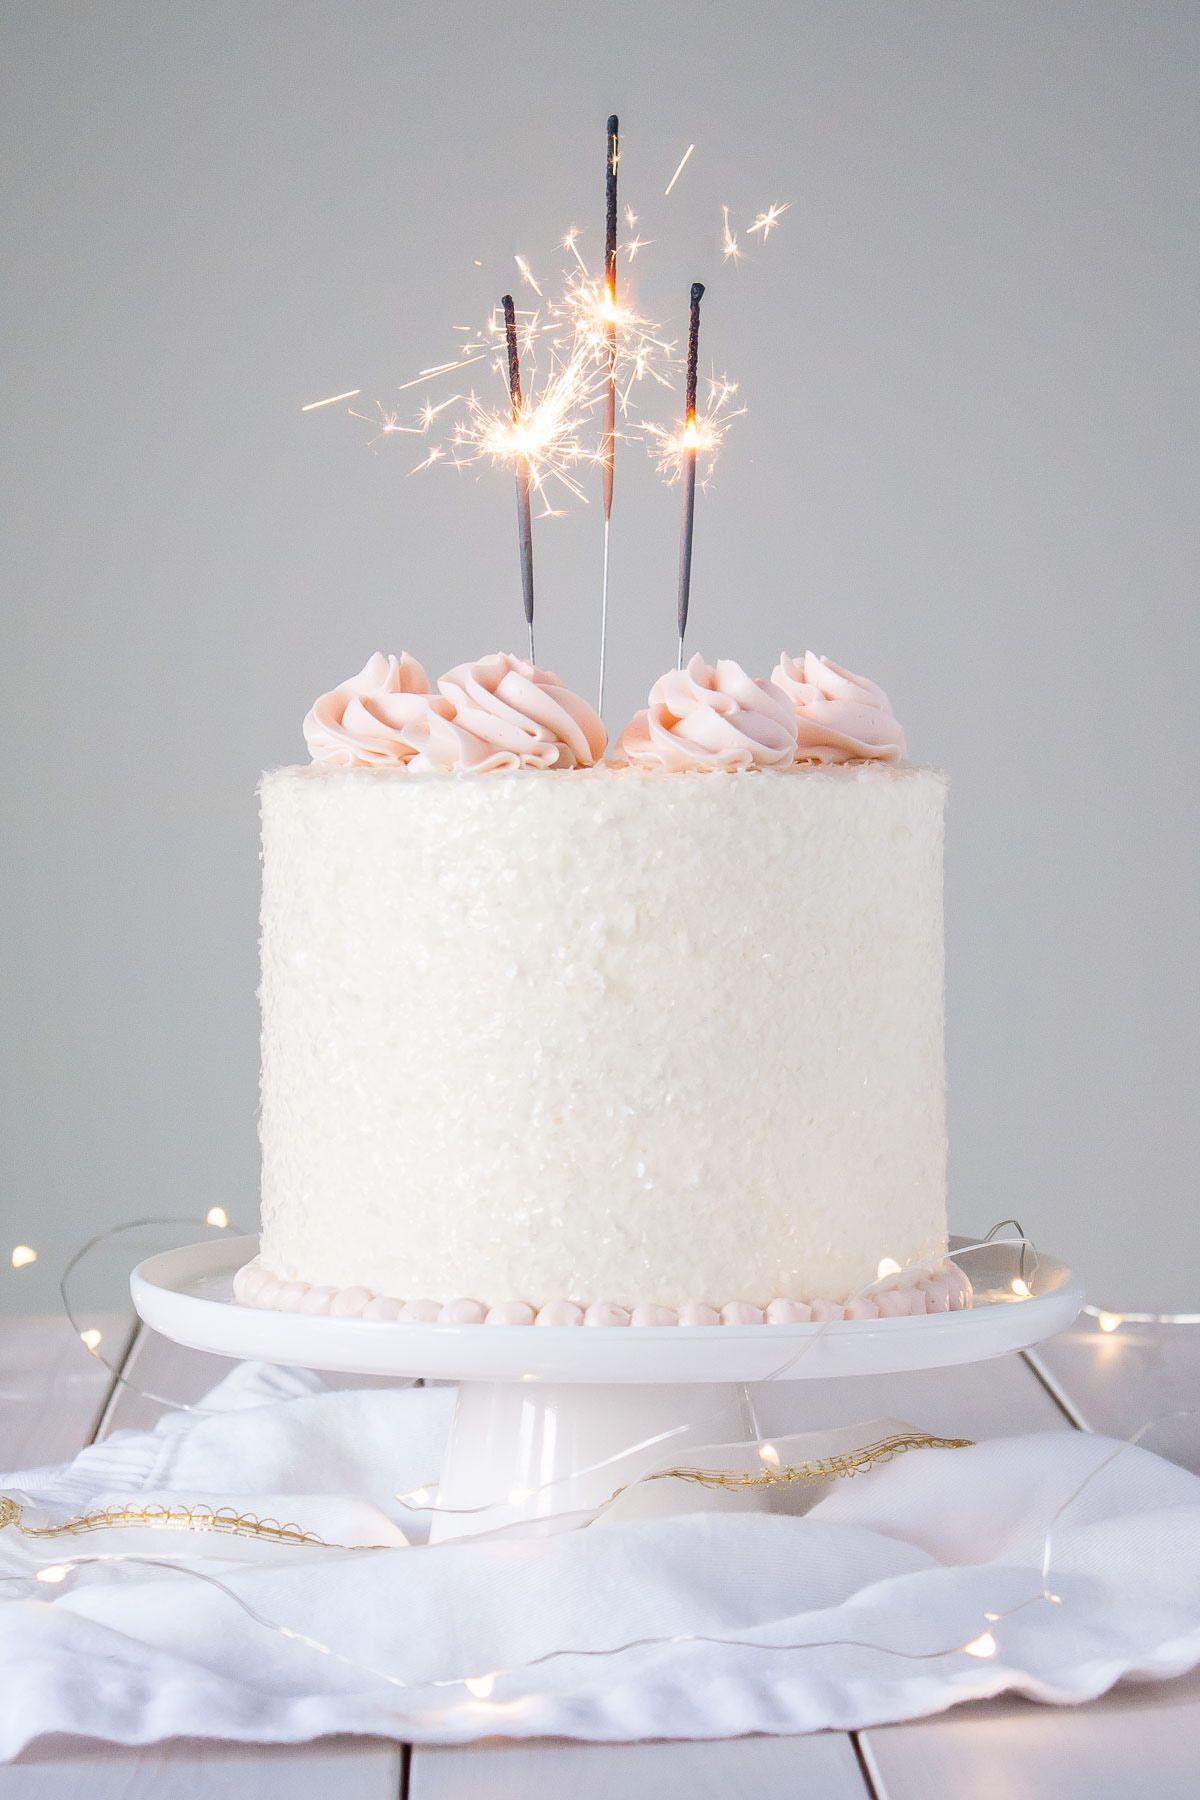 Happy 70th Birthday Cake Topper